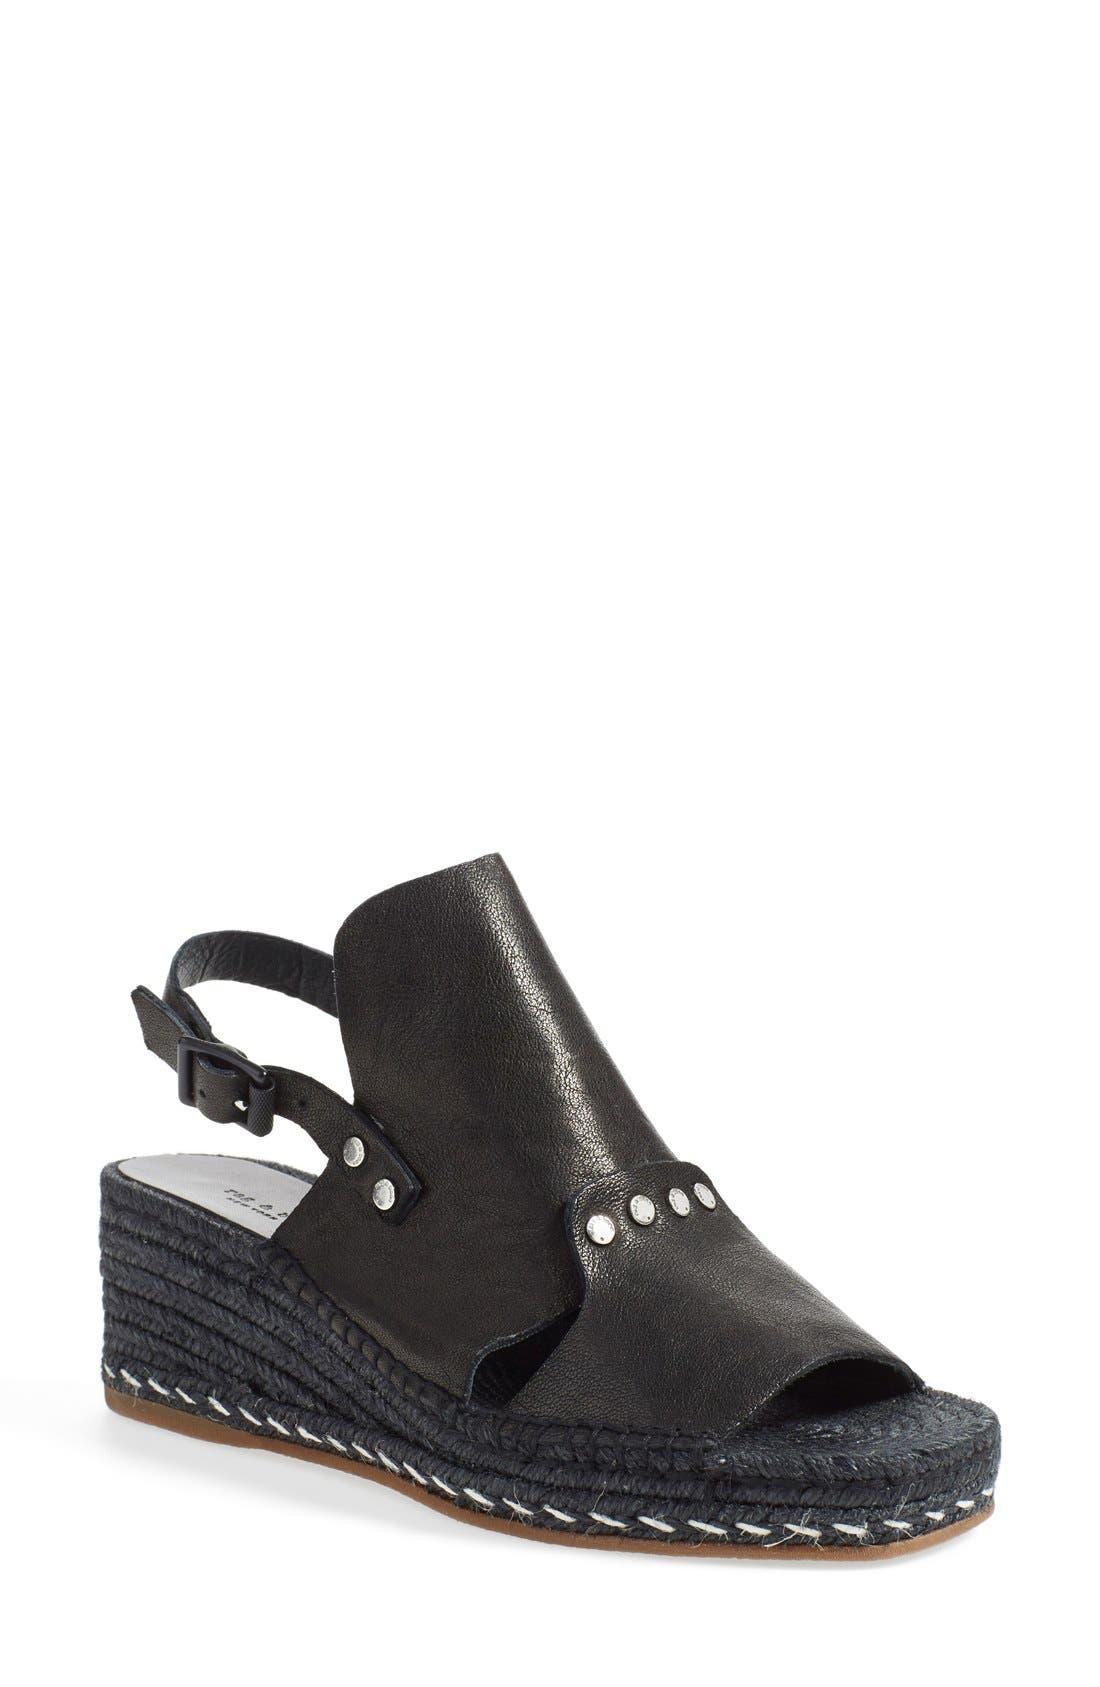 'Sayre II' Espadrille Wedge Sandal,                             Main thumbnail 1, color,                             001